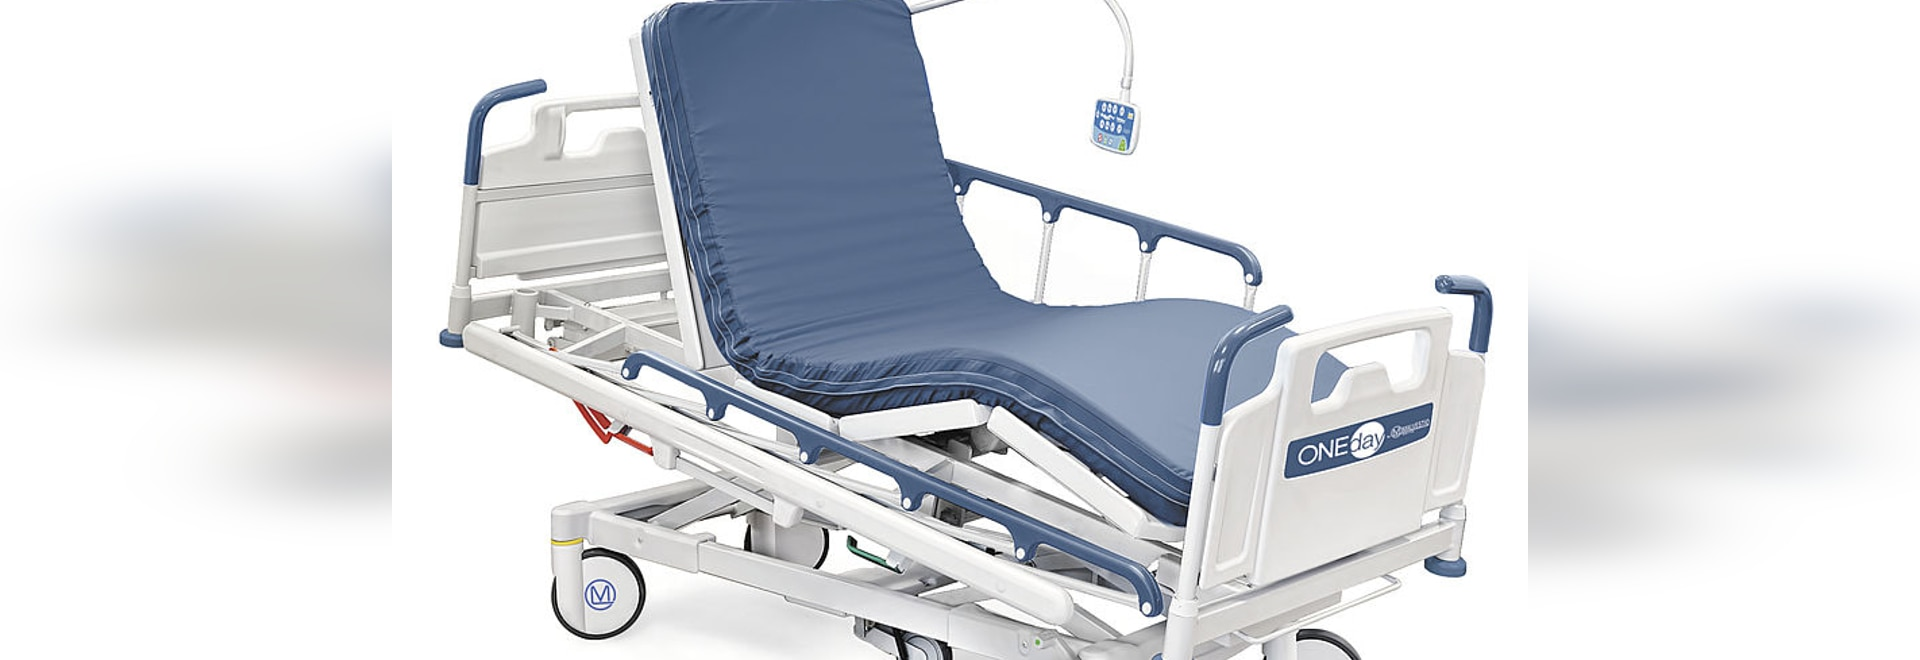 ONEday electric stretcher day hospital